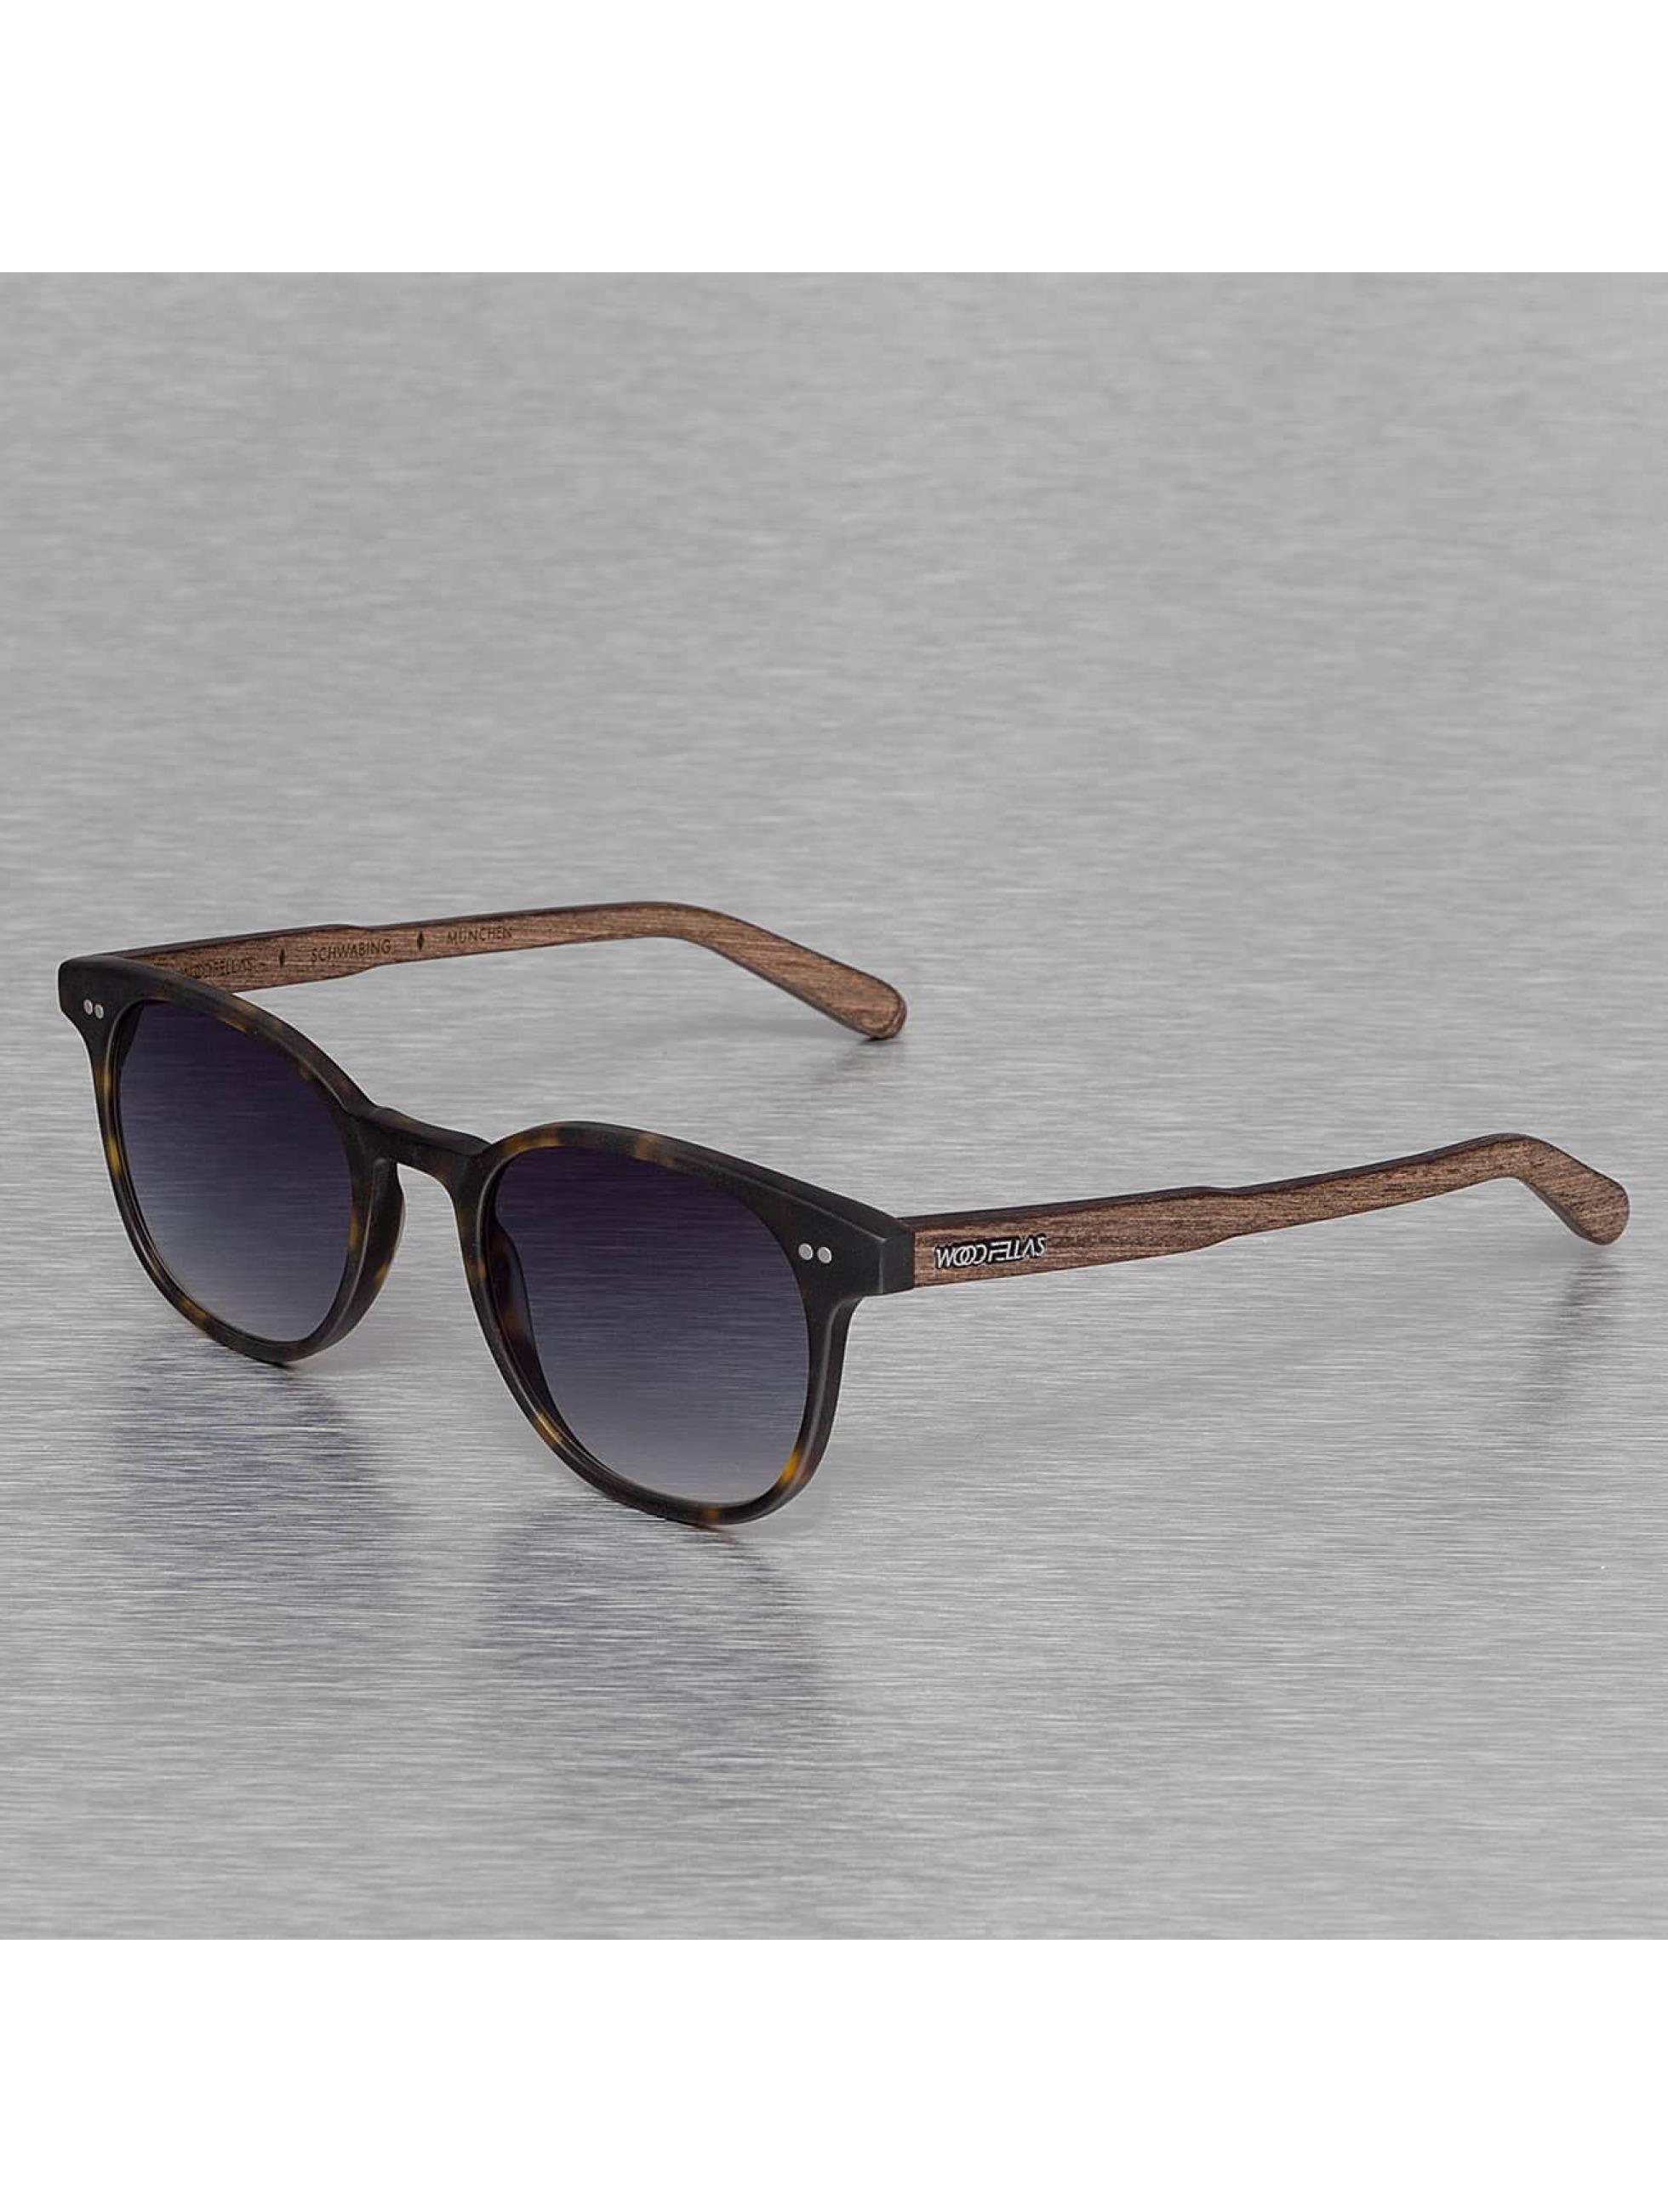 Wood Fellas Eyewear Aurinkolasit Eyewear Schwabing Polarized Mirror ruskea